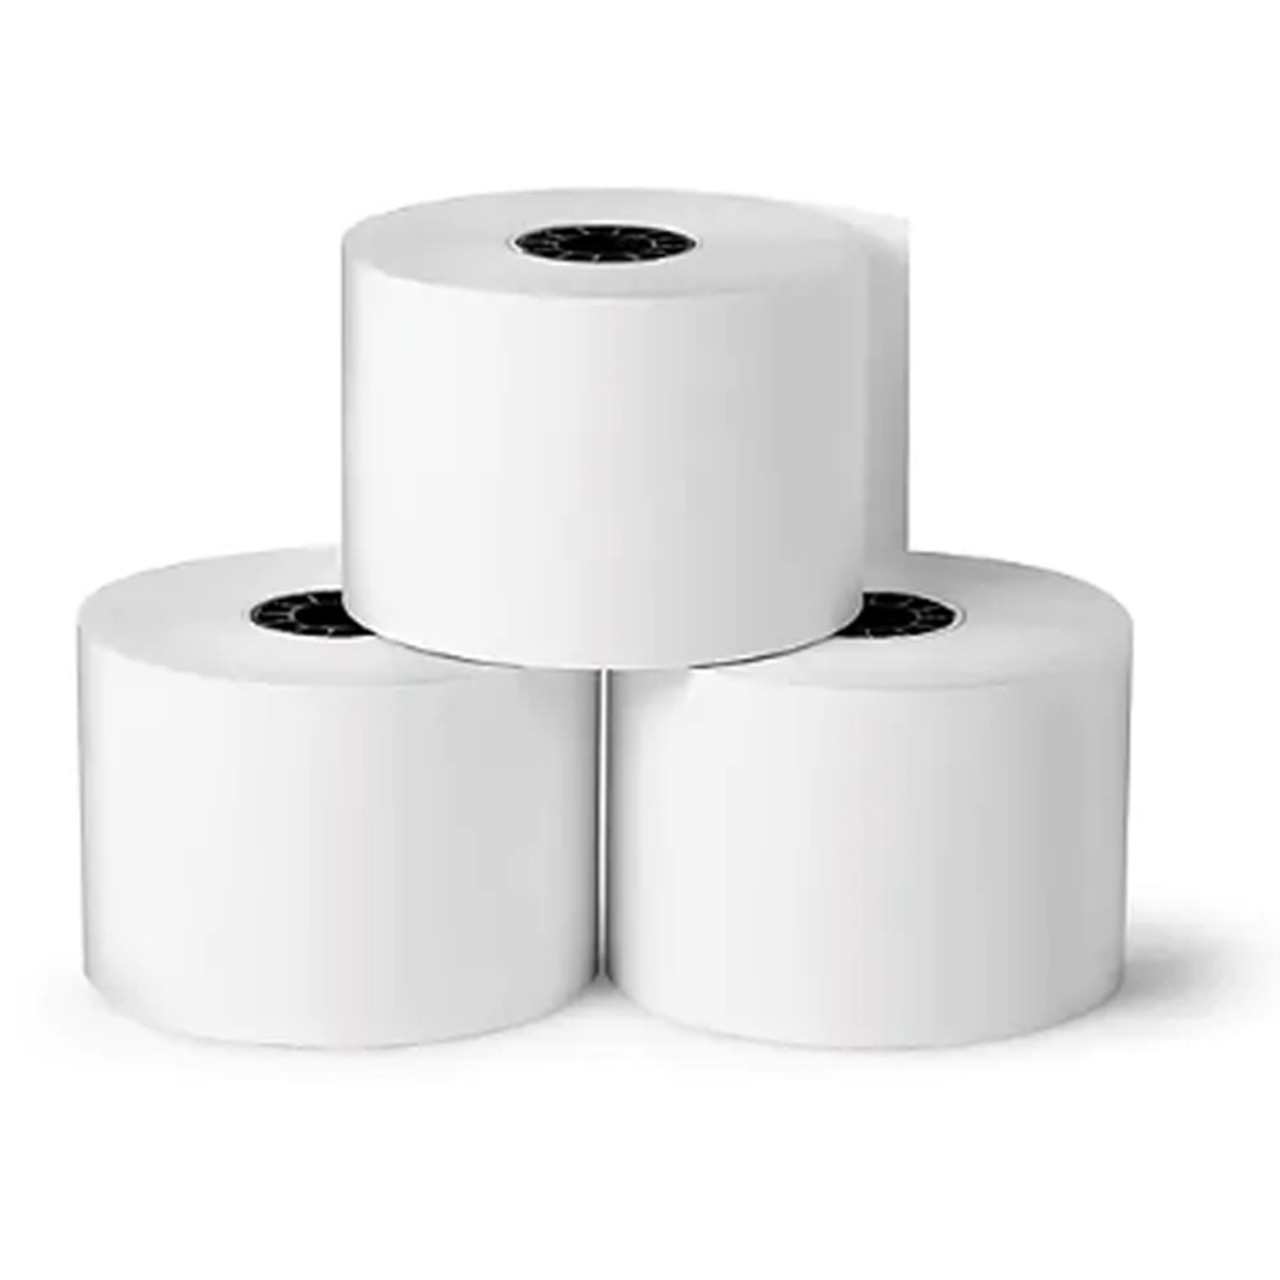 Large Print Calculator - Paper Rolls (3 rolls)